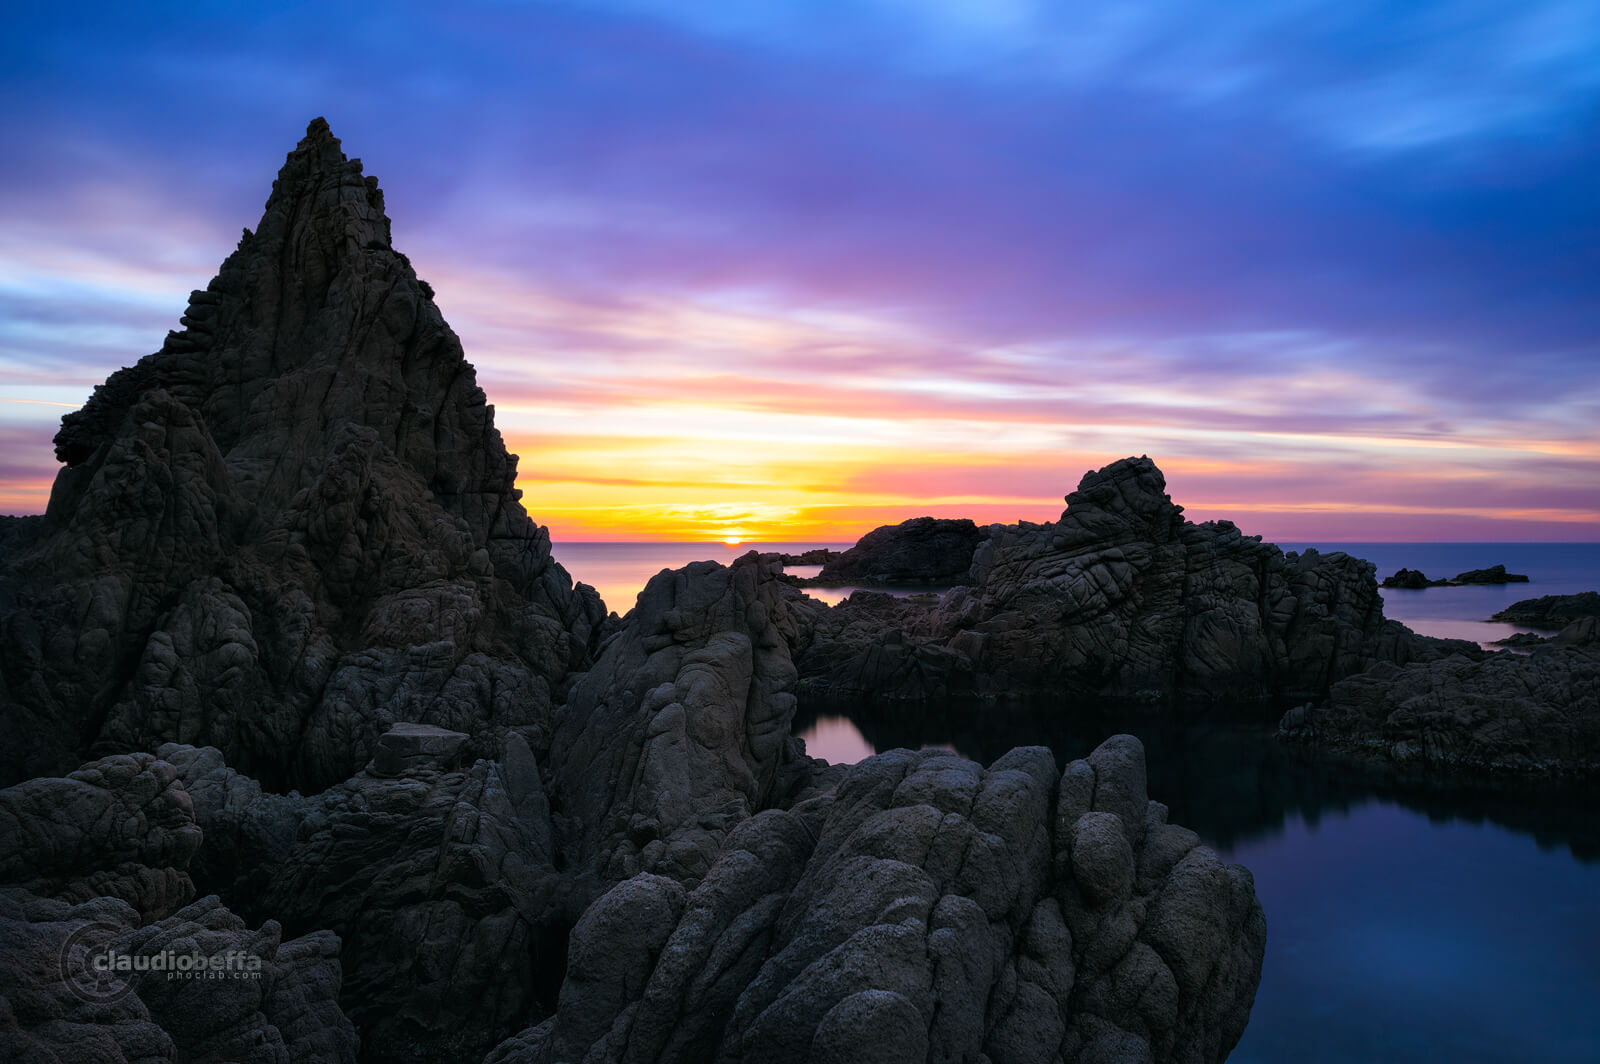 Capo Pecora, Sardinia, Italy, Sea, Seascape, Sunset, Blue hour, Cove, Rocks, Silhouettes, Long exposure, Ephemeral